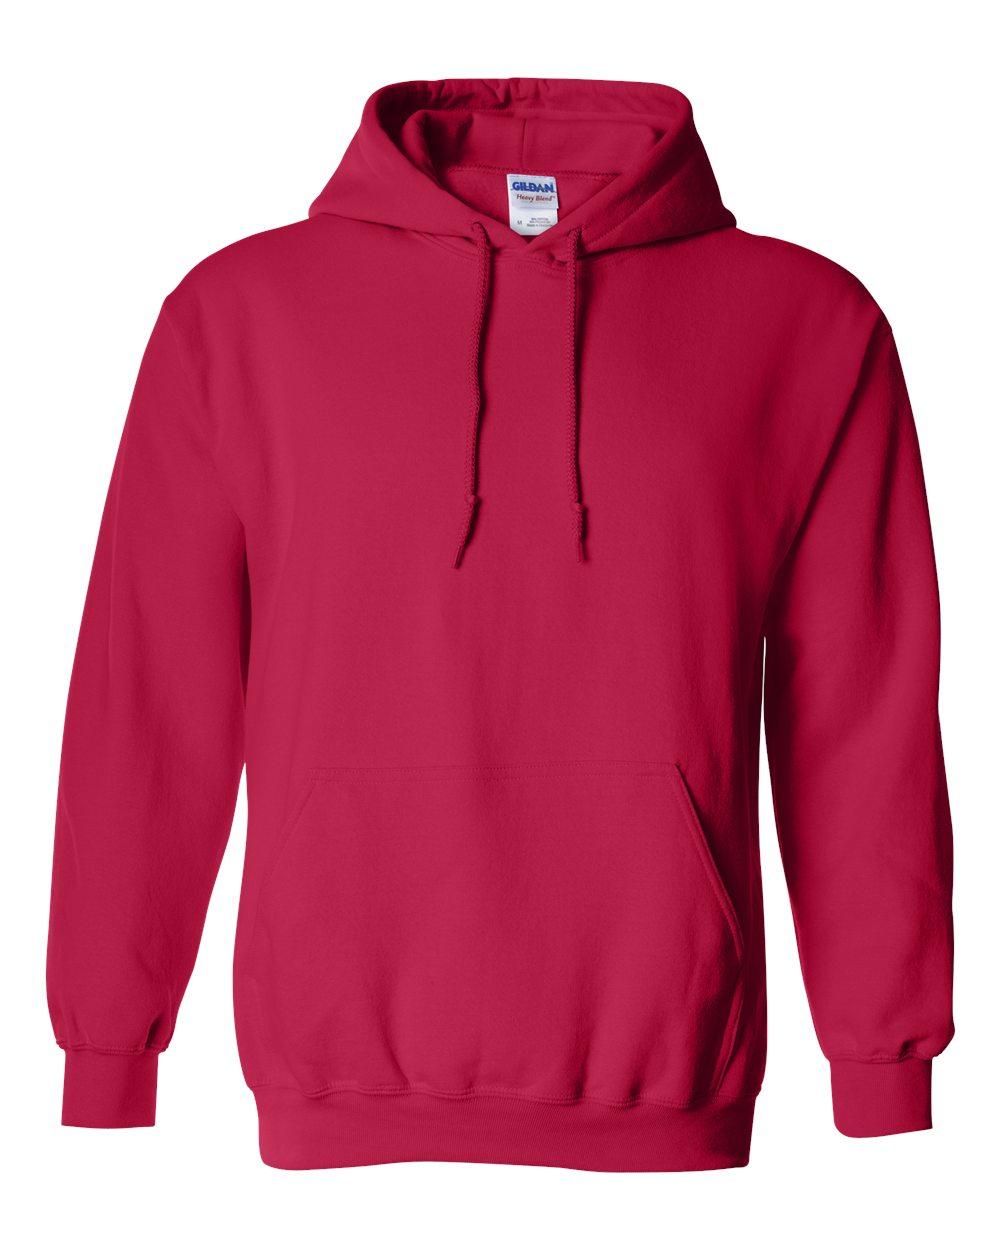 Gildan-Mens-Blank-Hoodie-Heavy-Blend-Hooded-Sweatshirt-Solid-18500-up-to-5XL thumbnail 21